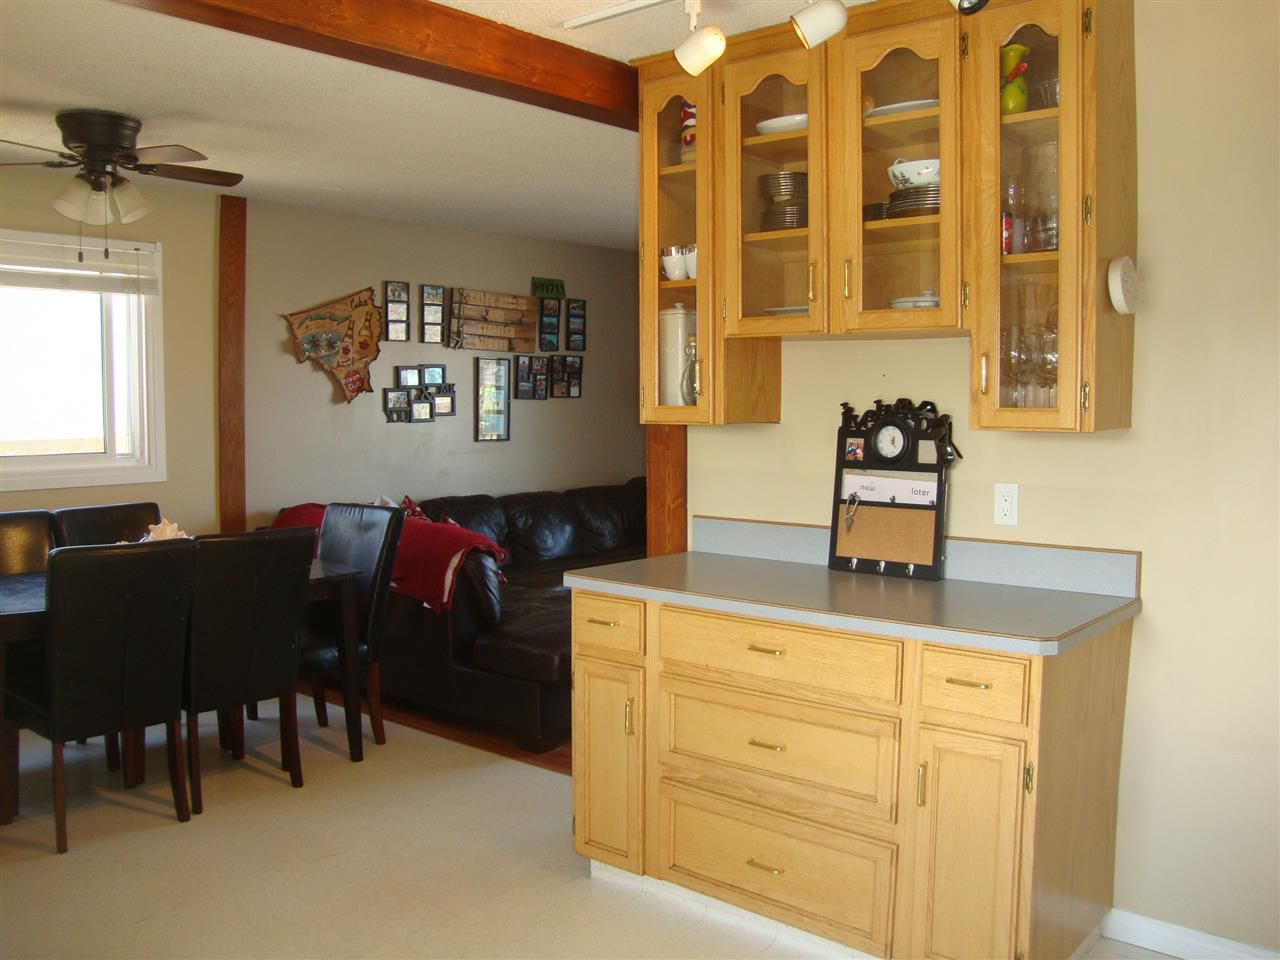 Photo 14: Photos: 4711 51A Avenue: Bon Accord House for sale : MLS®# E4149195